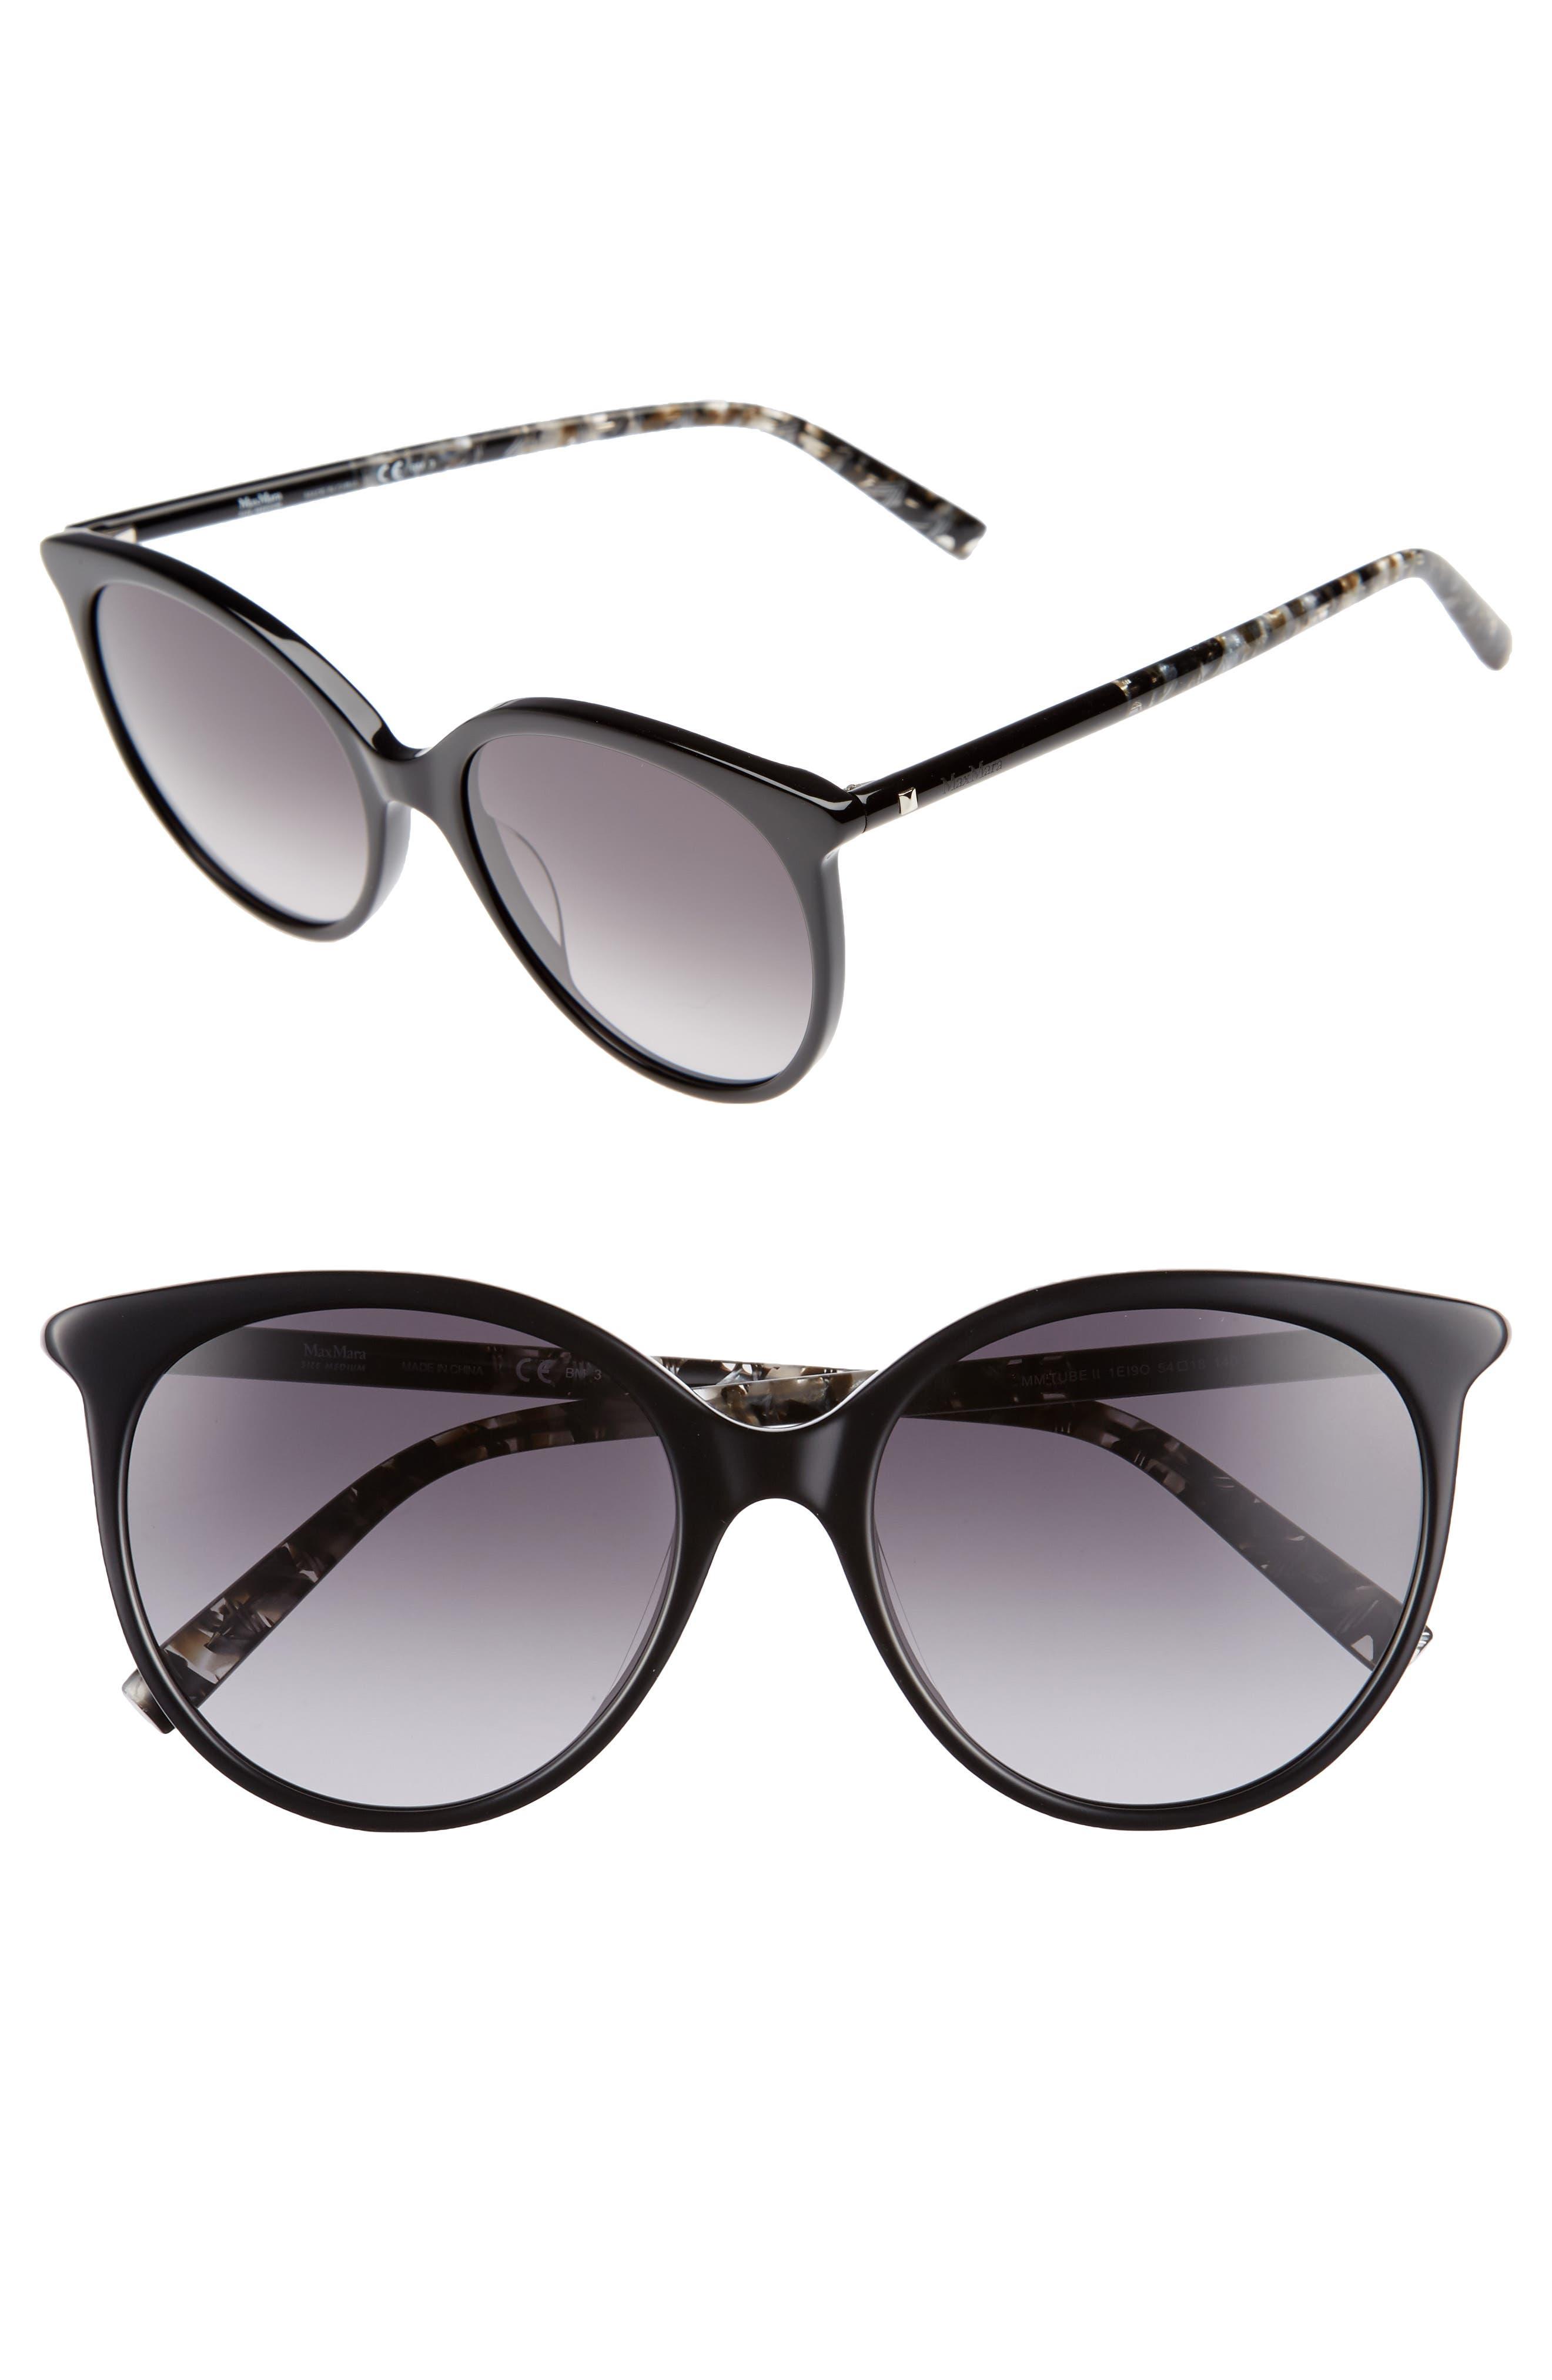 Main Image - Max Mara Tube 54mm Gradient Lens Cat Eye Sunglasses